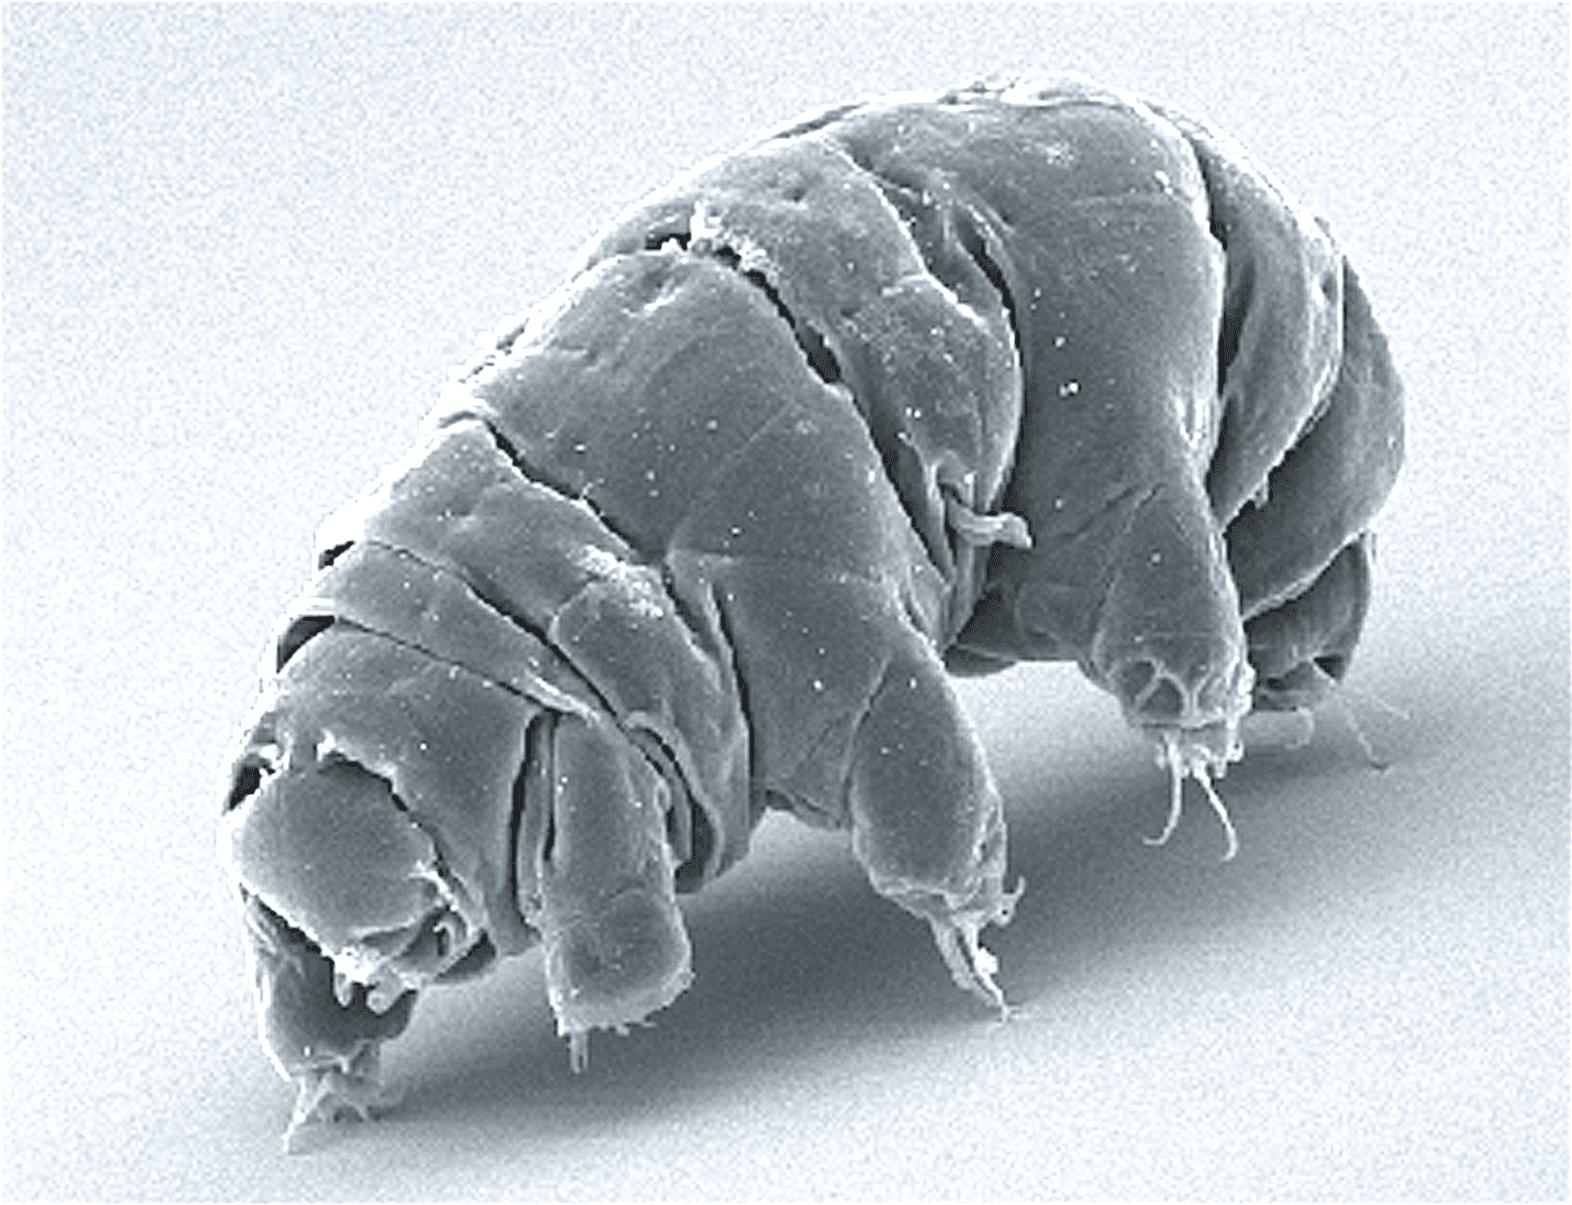 4 Ways Tardigrades Are Nearly Indestructible